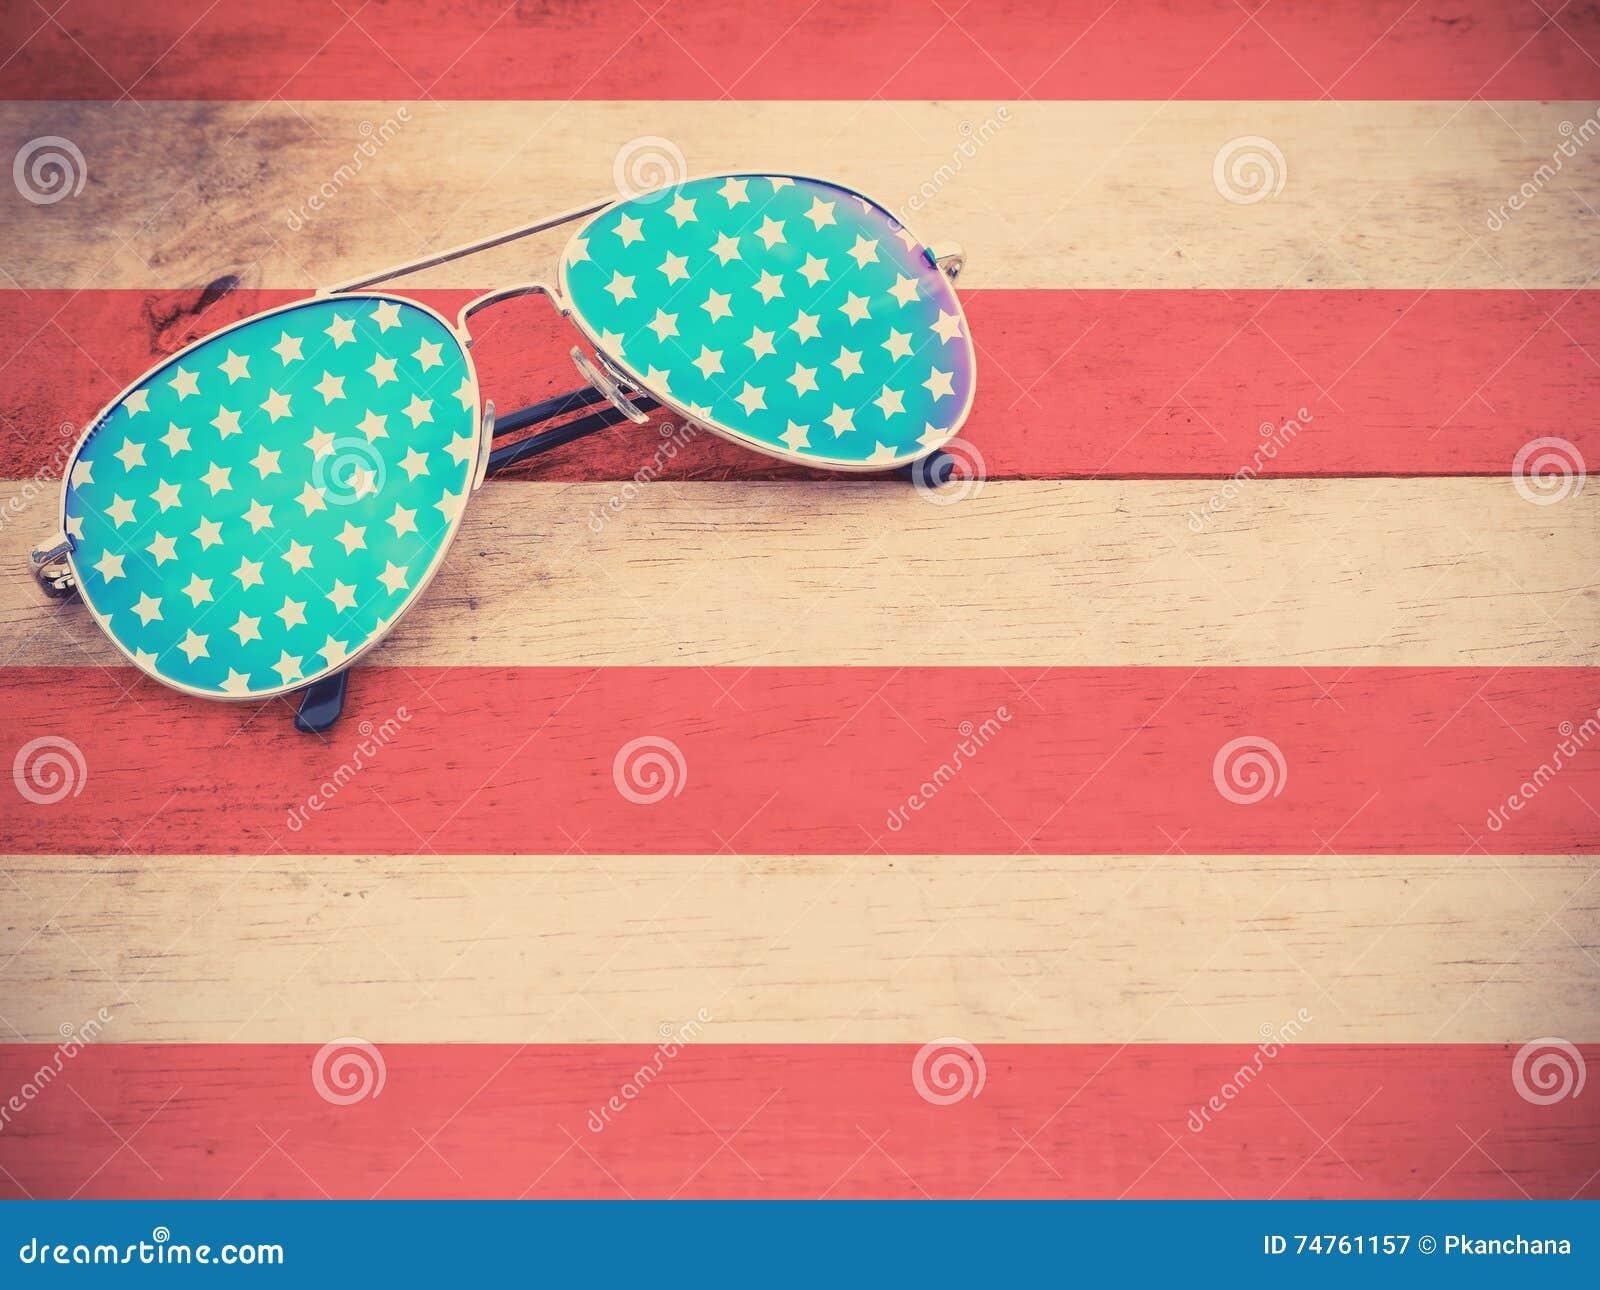 Mirror sunglasses as American flag pattern